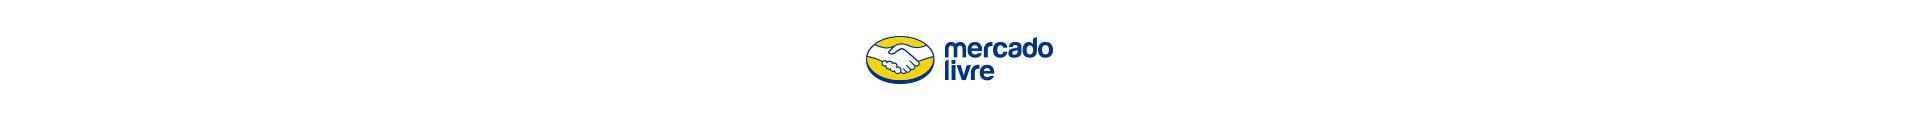 Portfolio_Logos_MercadoLivre.jpg